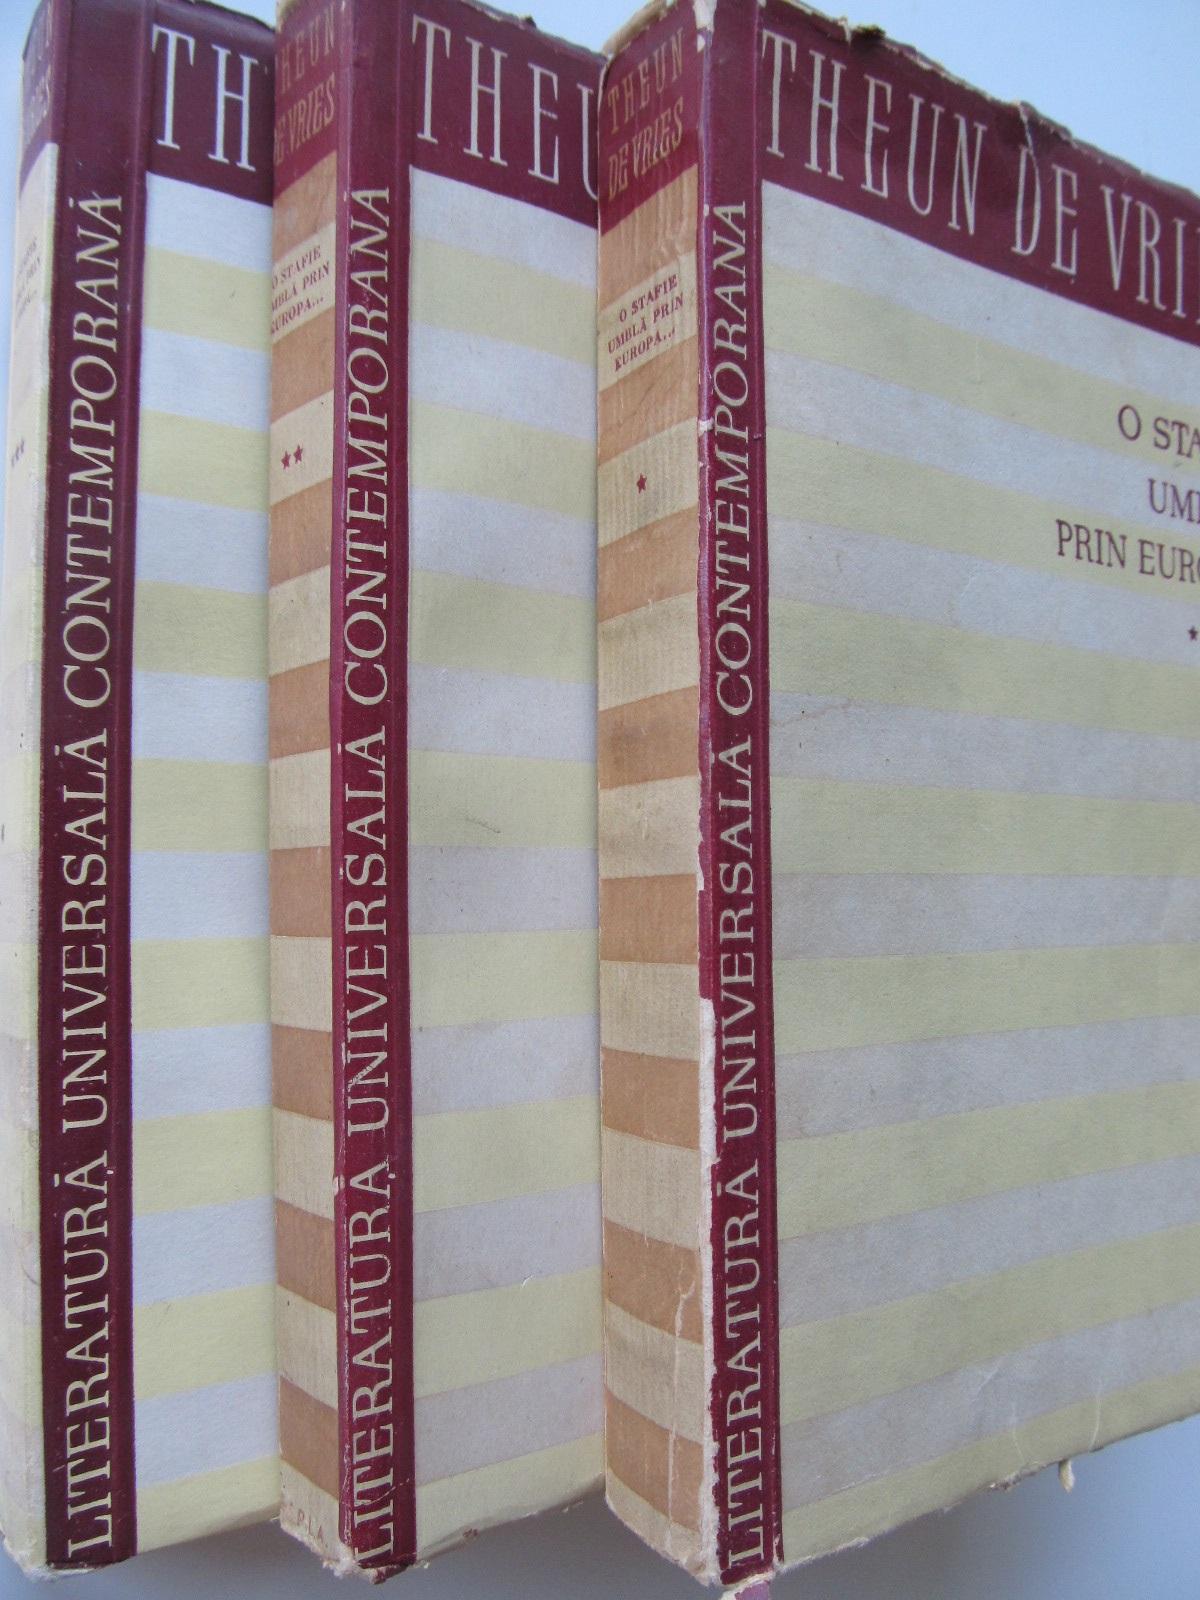 O stafie umbla prin Europa (3 vol.) - Theun De Vries | Detalii carte